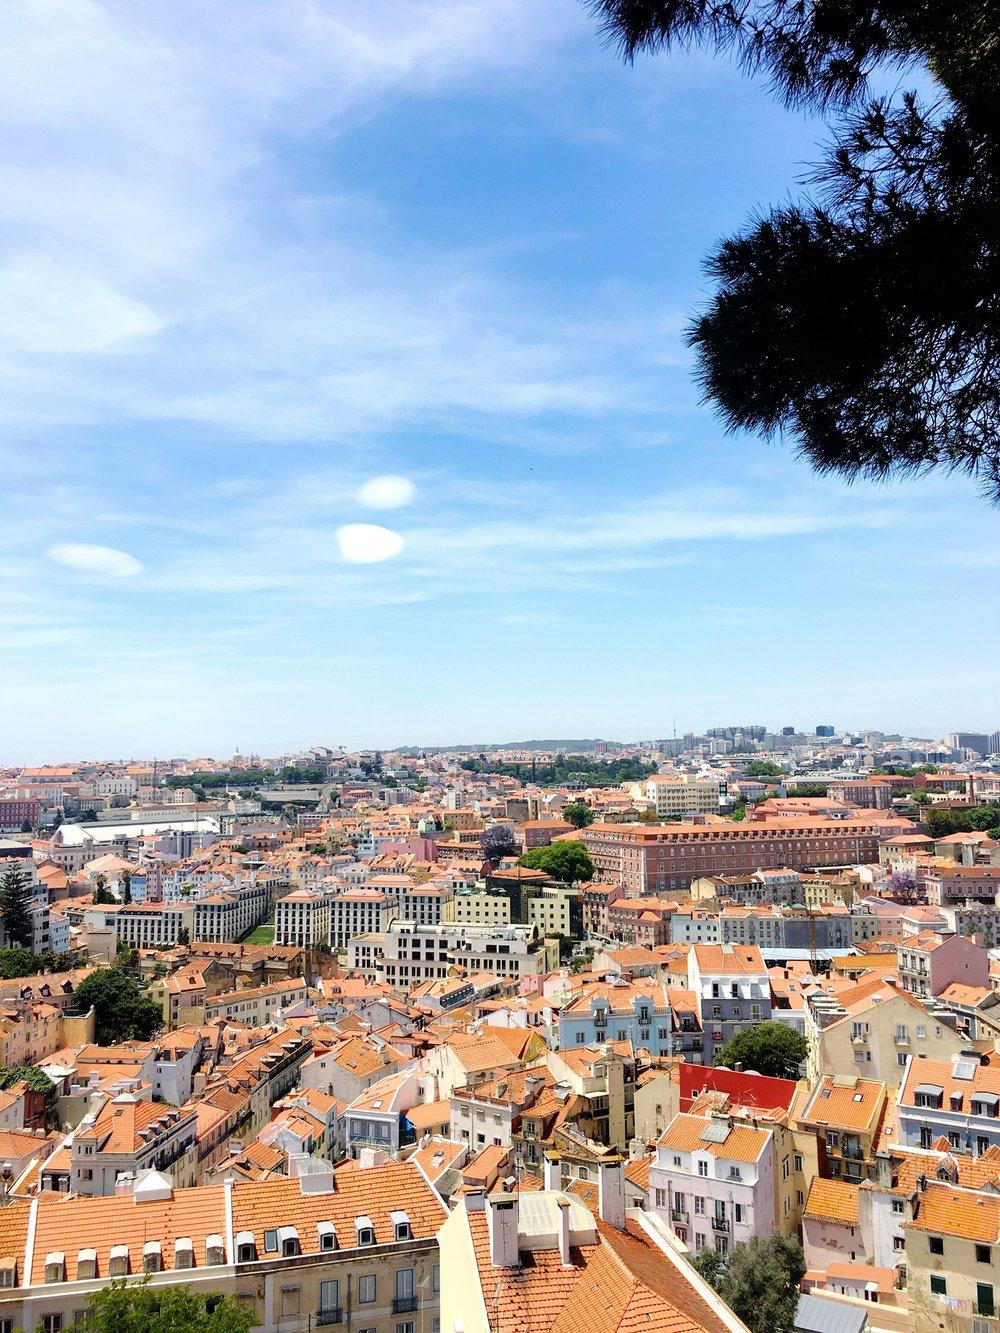 views from Sophia de Mello Beyner Viewpoint